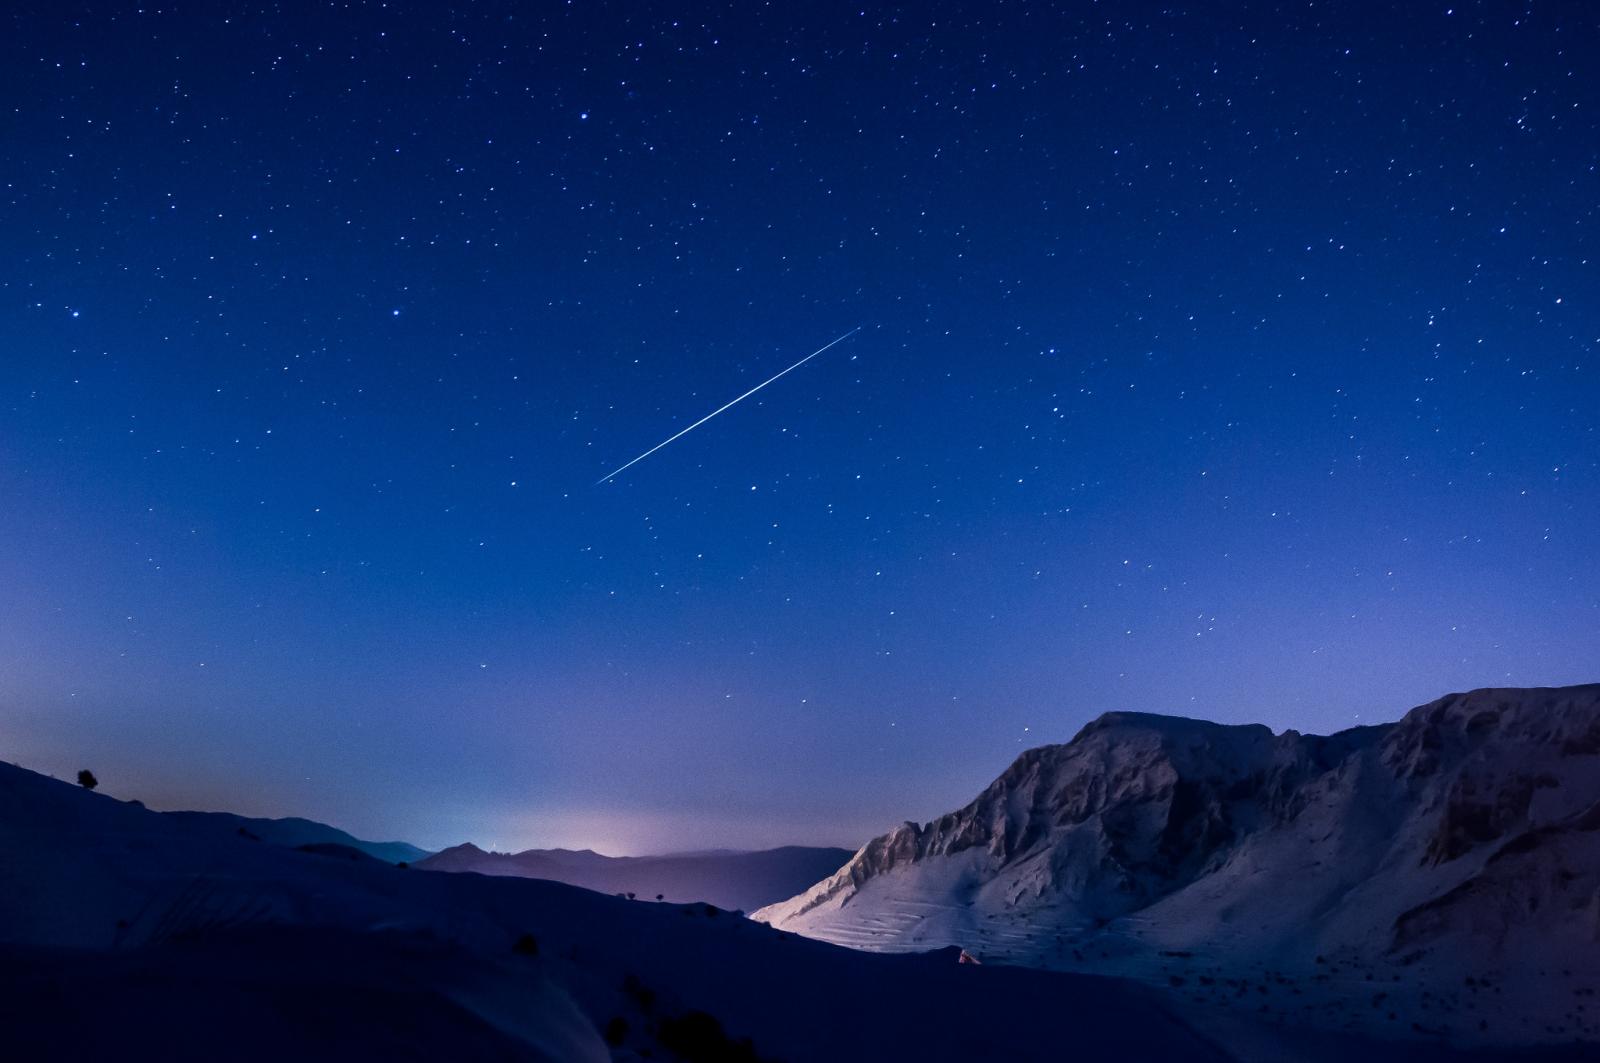 Falling Stars Live Wallpaper Ursid Meteor Shower Where To Watch Last Shooting Stars Of